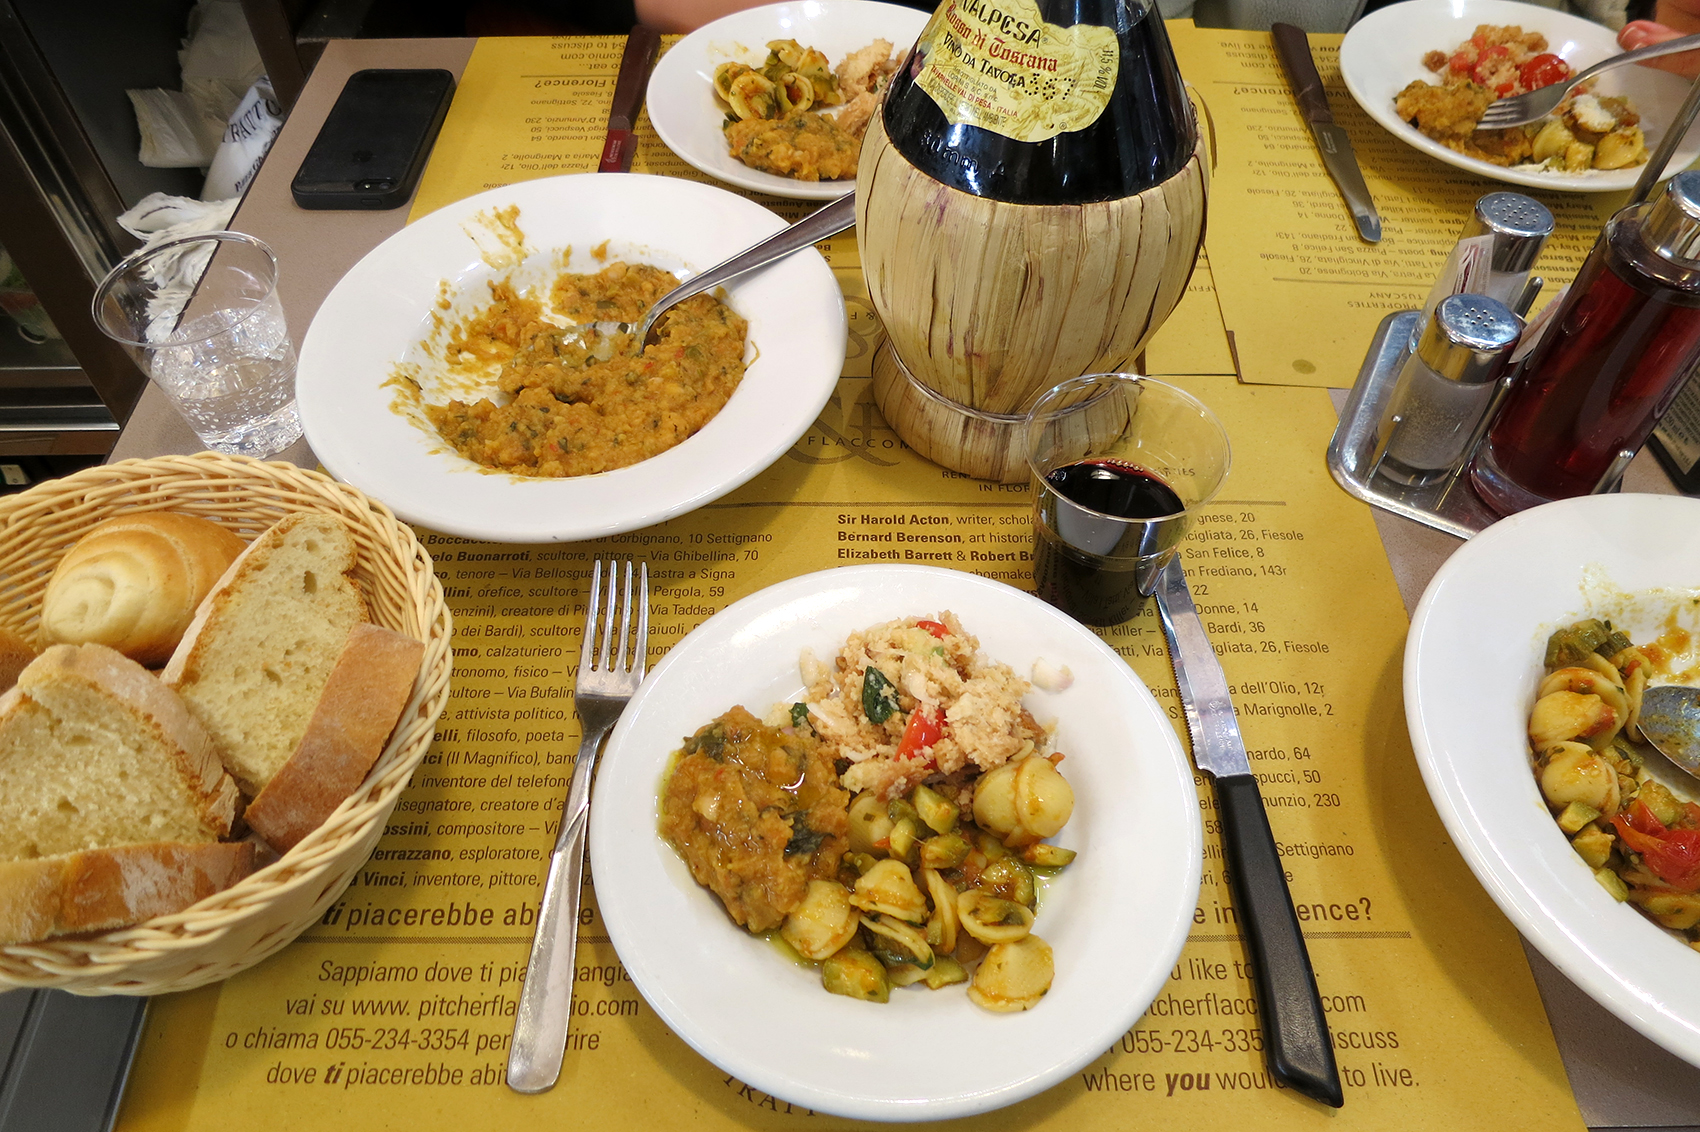 florence italian cuisine irvine - photo#40